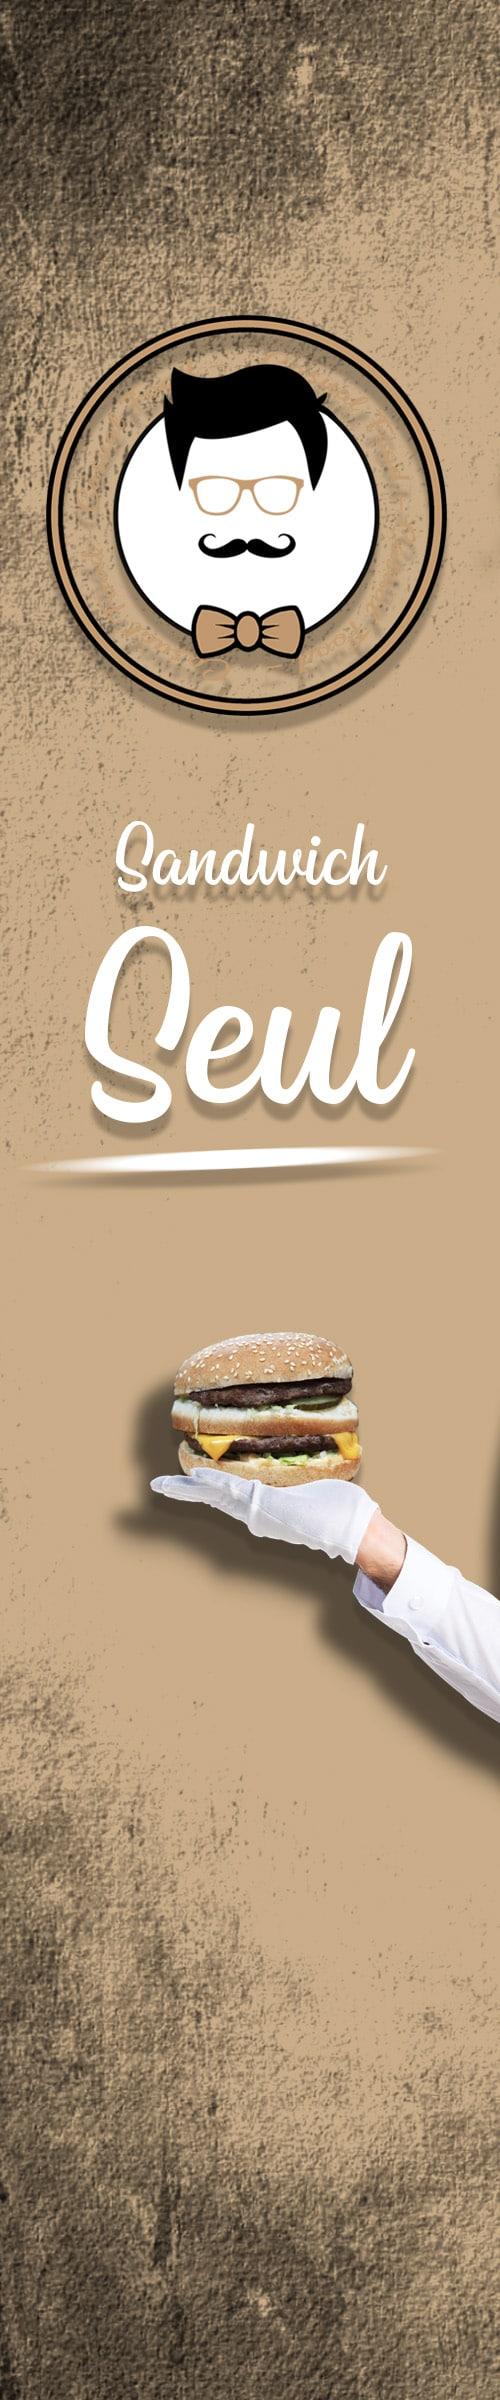 Sandwichseul3